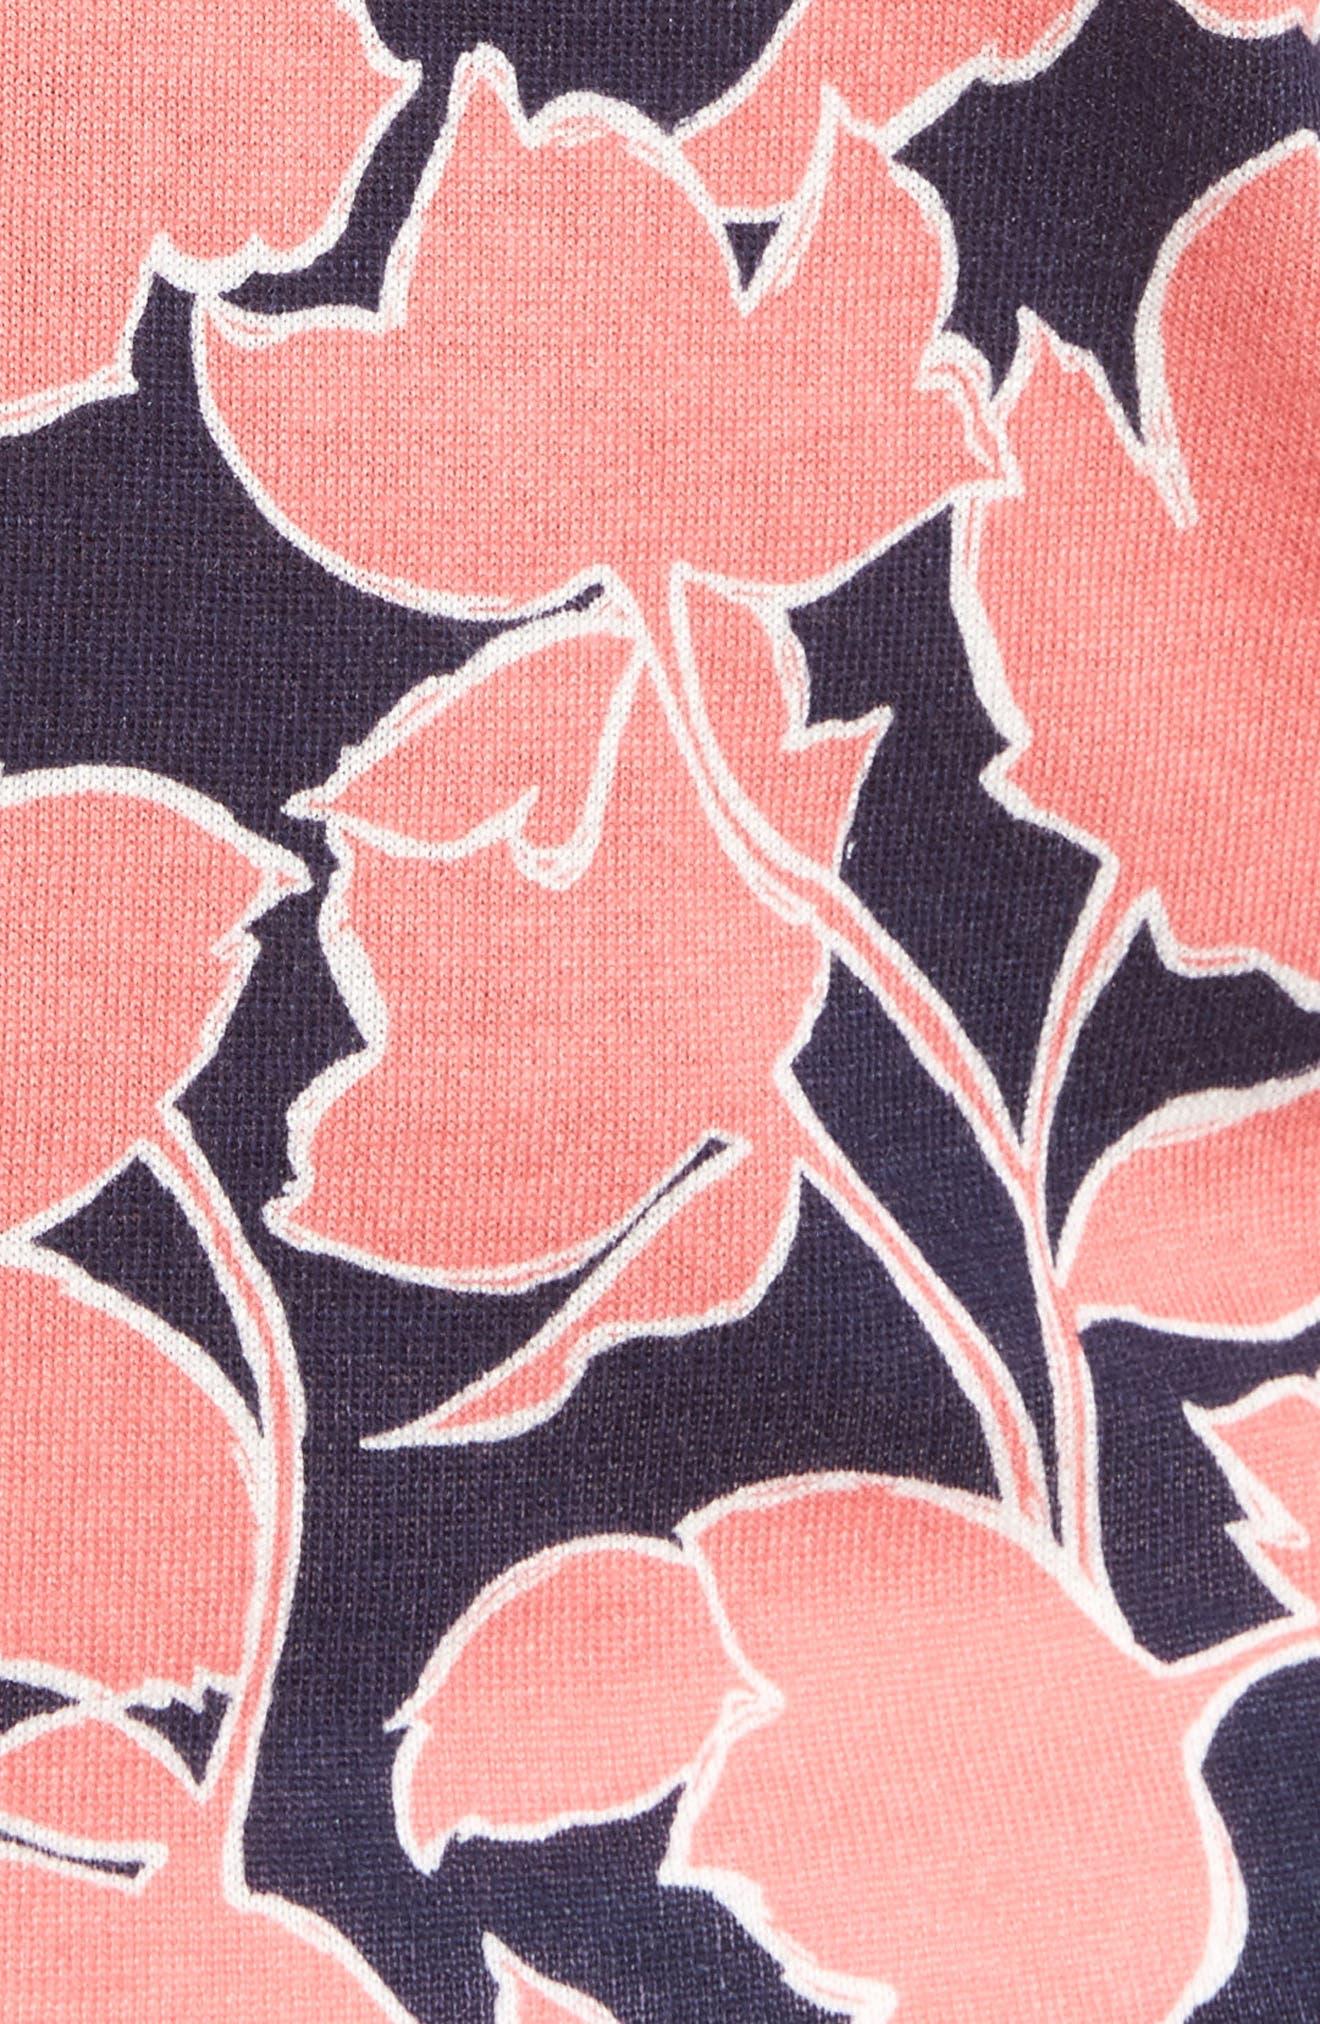 Cotton Blend Pullover,                             Alternate thumbnail 137, color,